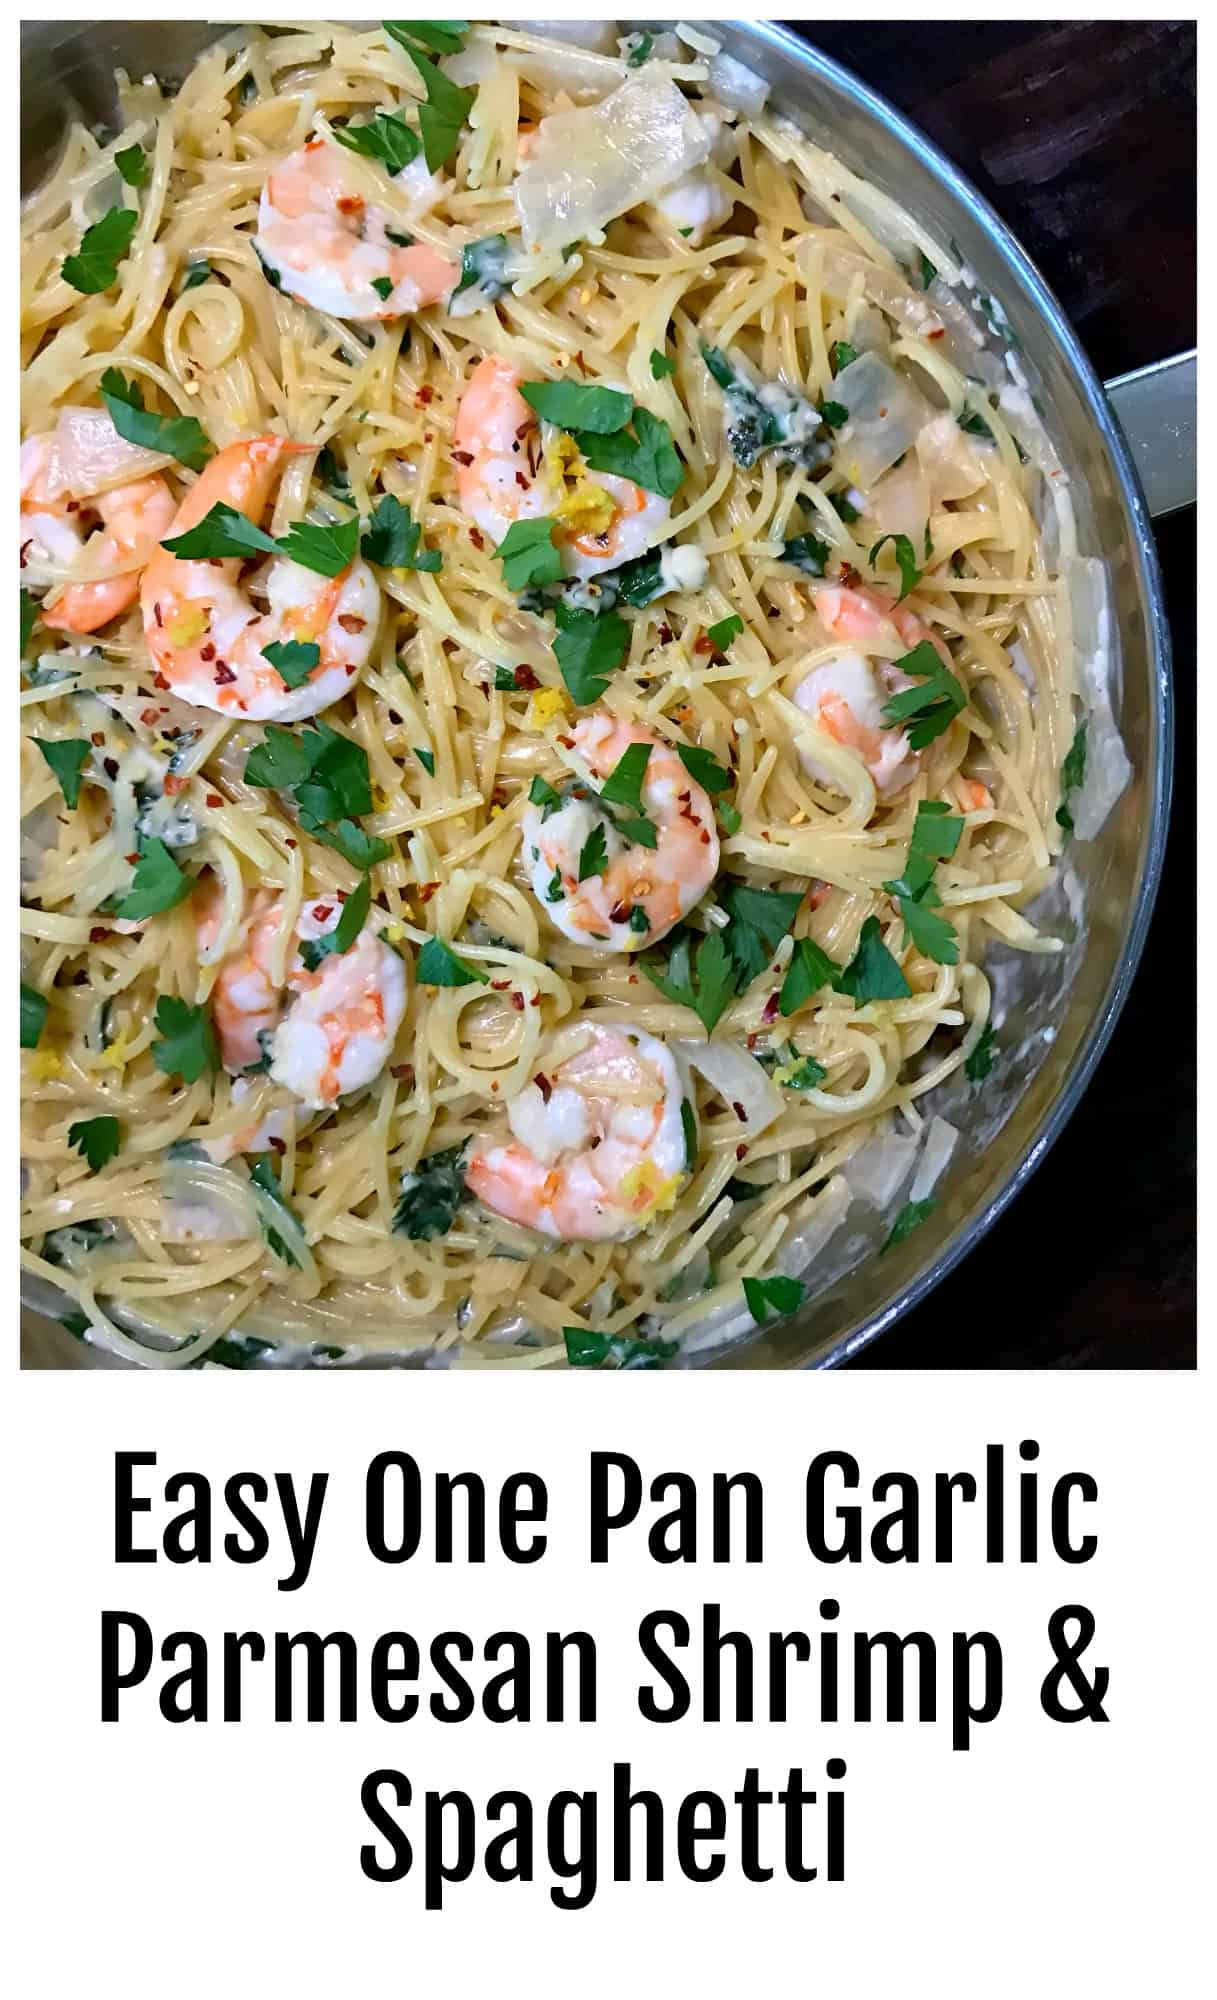 Easy One Pan Garlic Parmesan Shrimp and Spaghetti